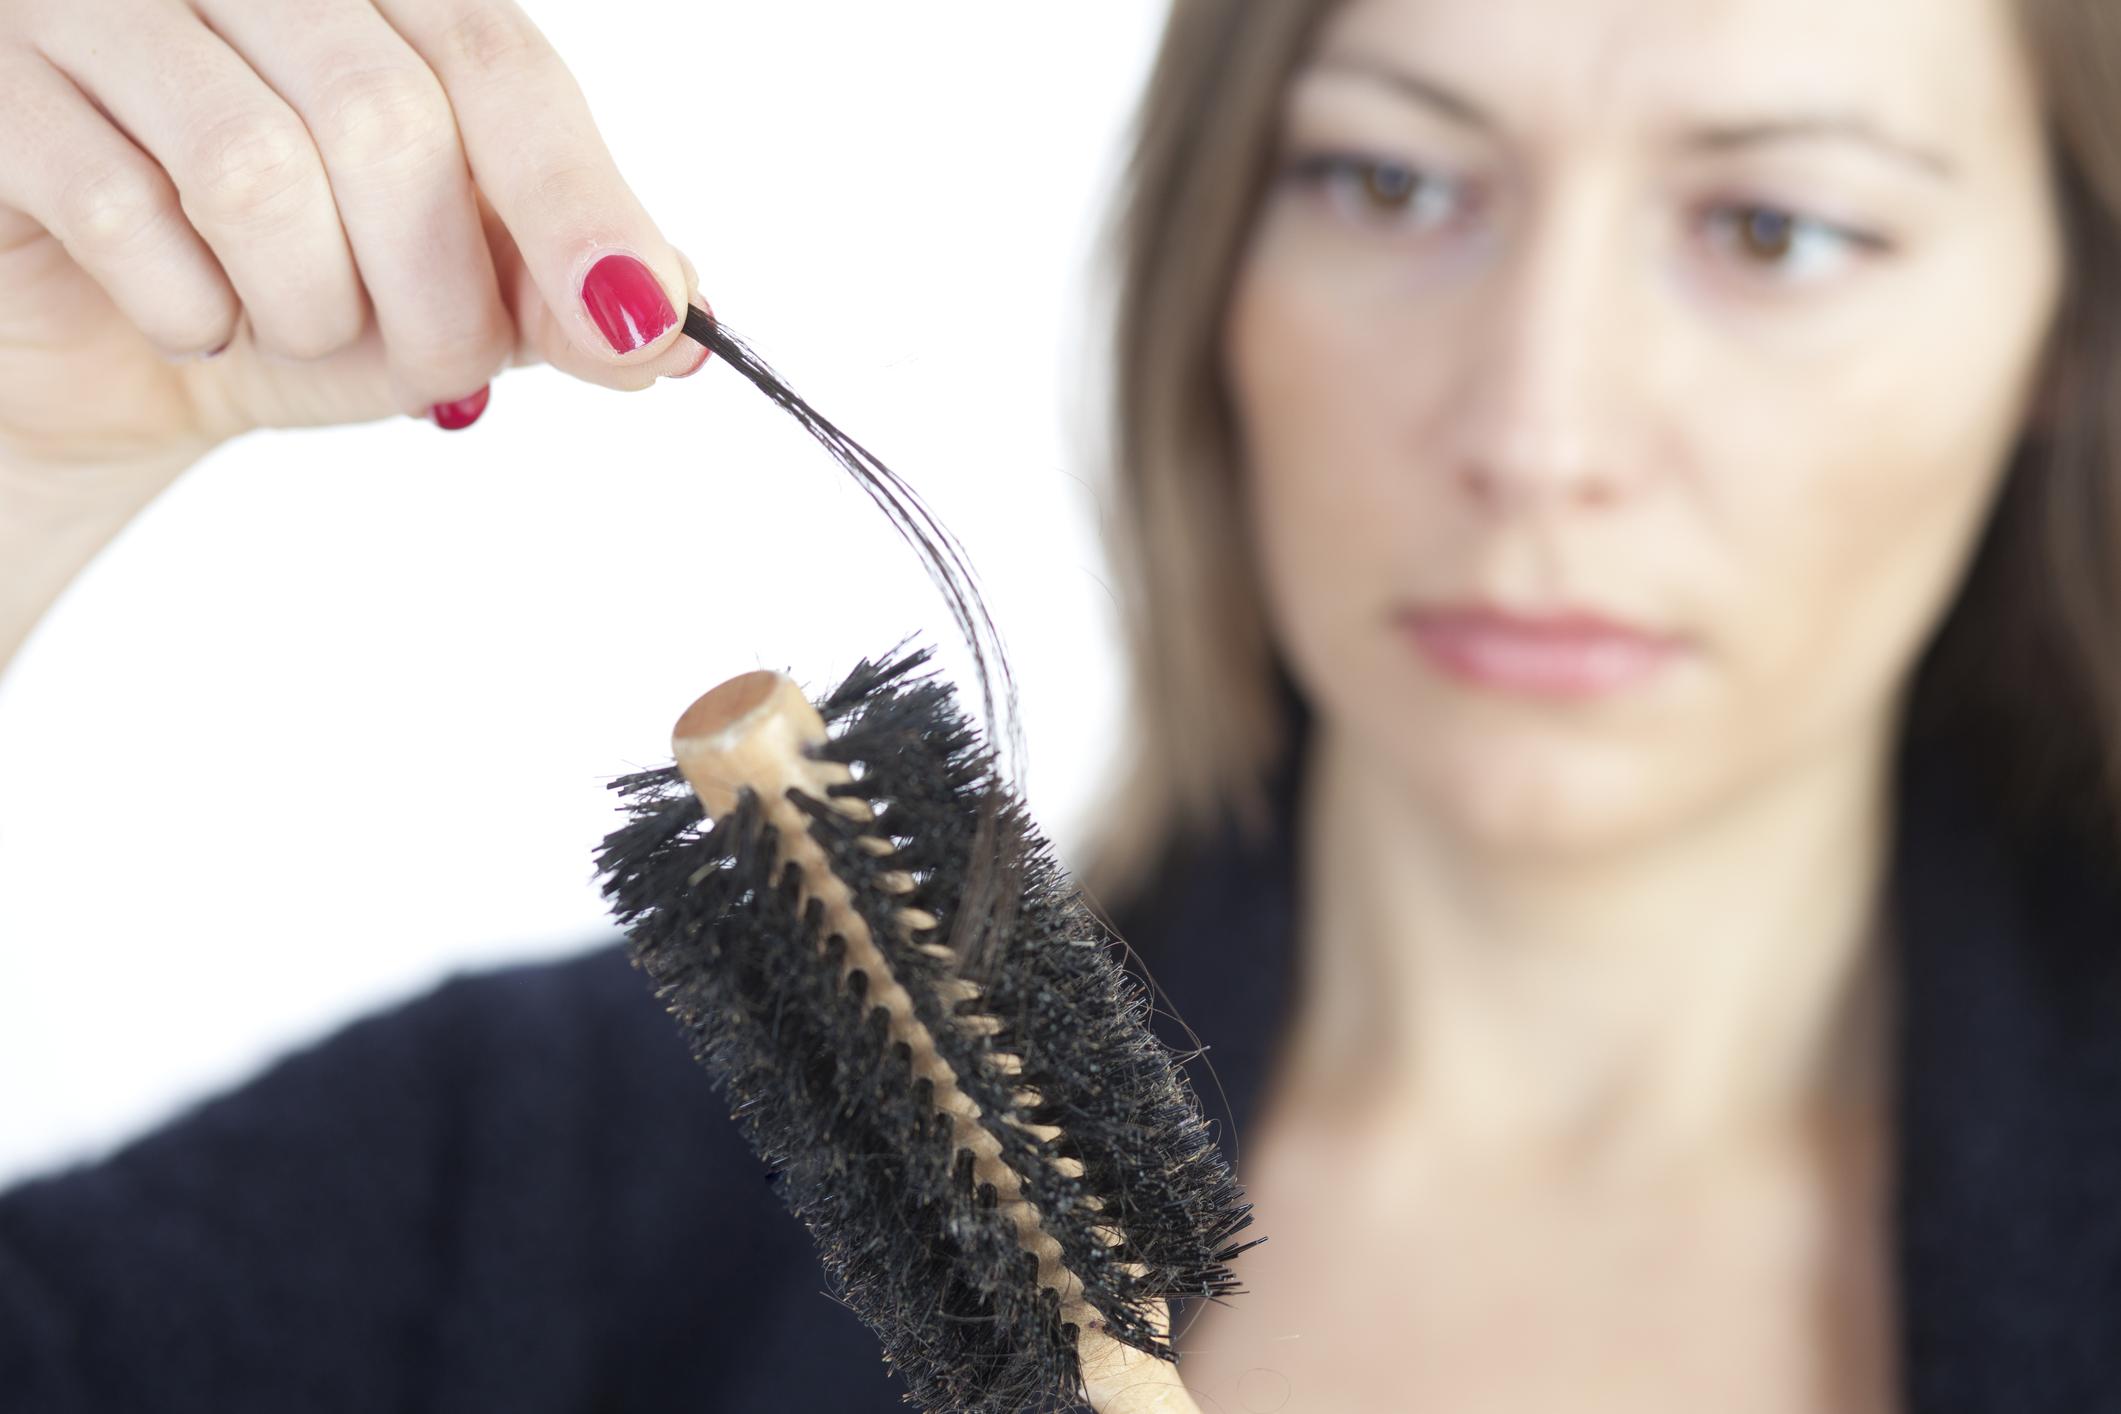 Hair loss from medications